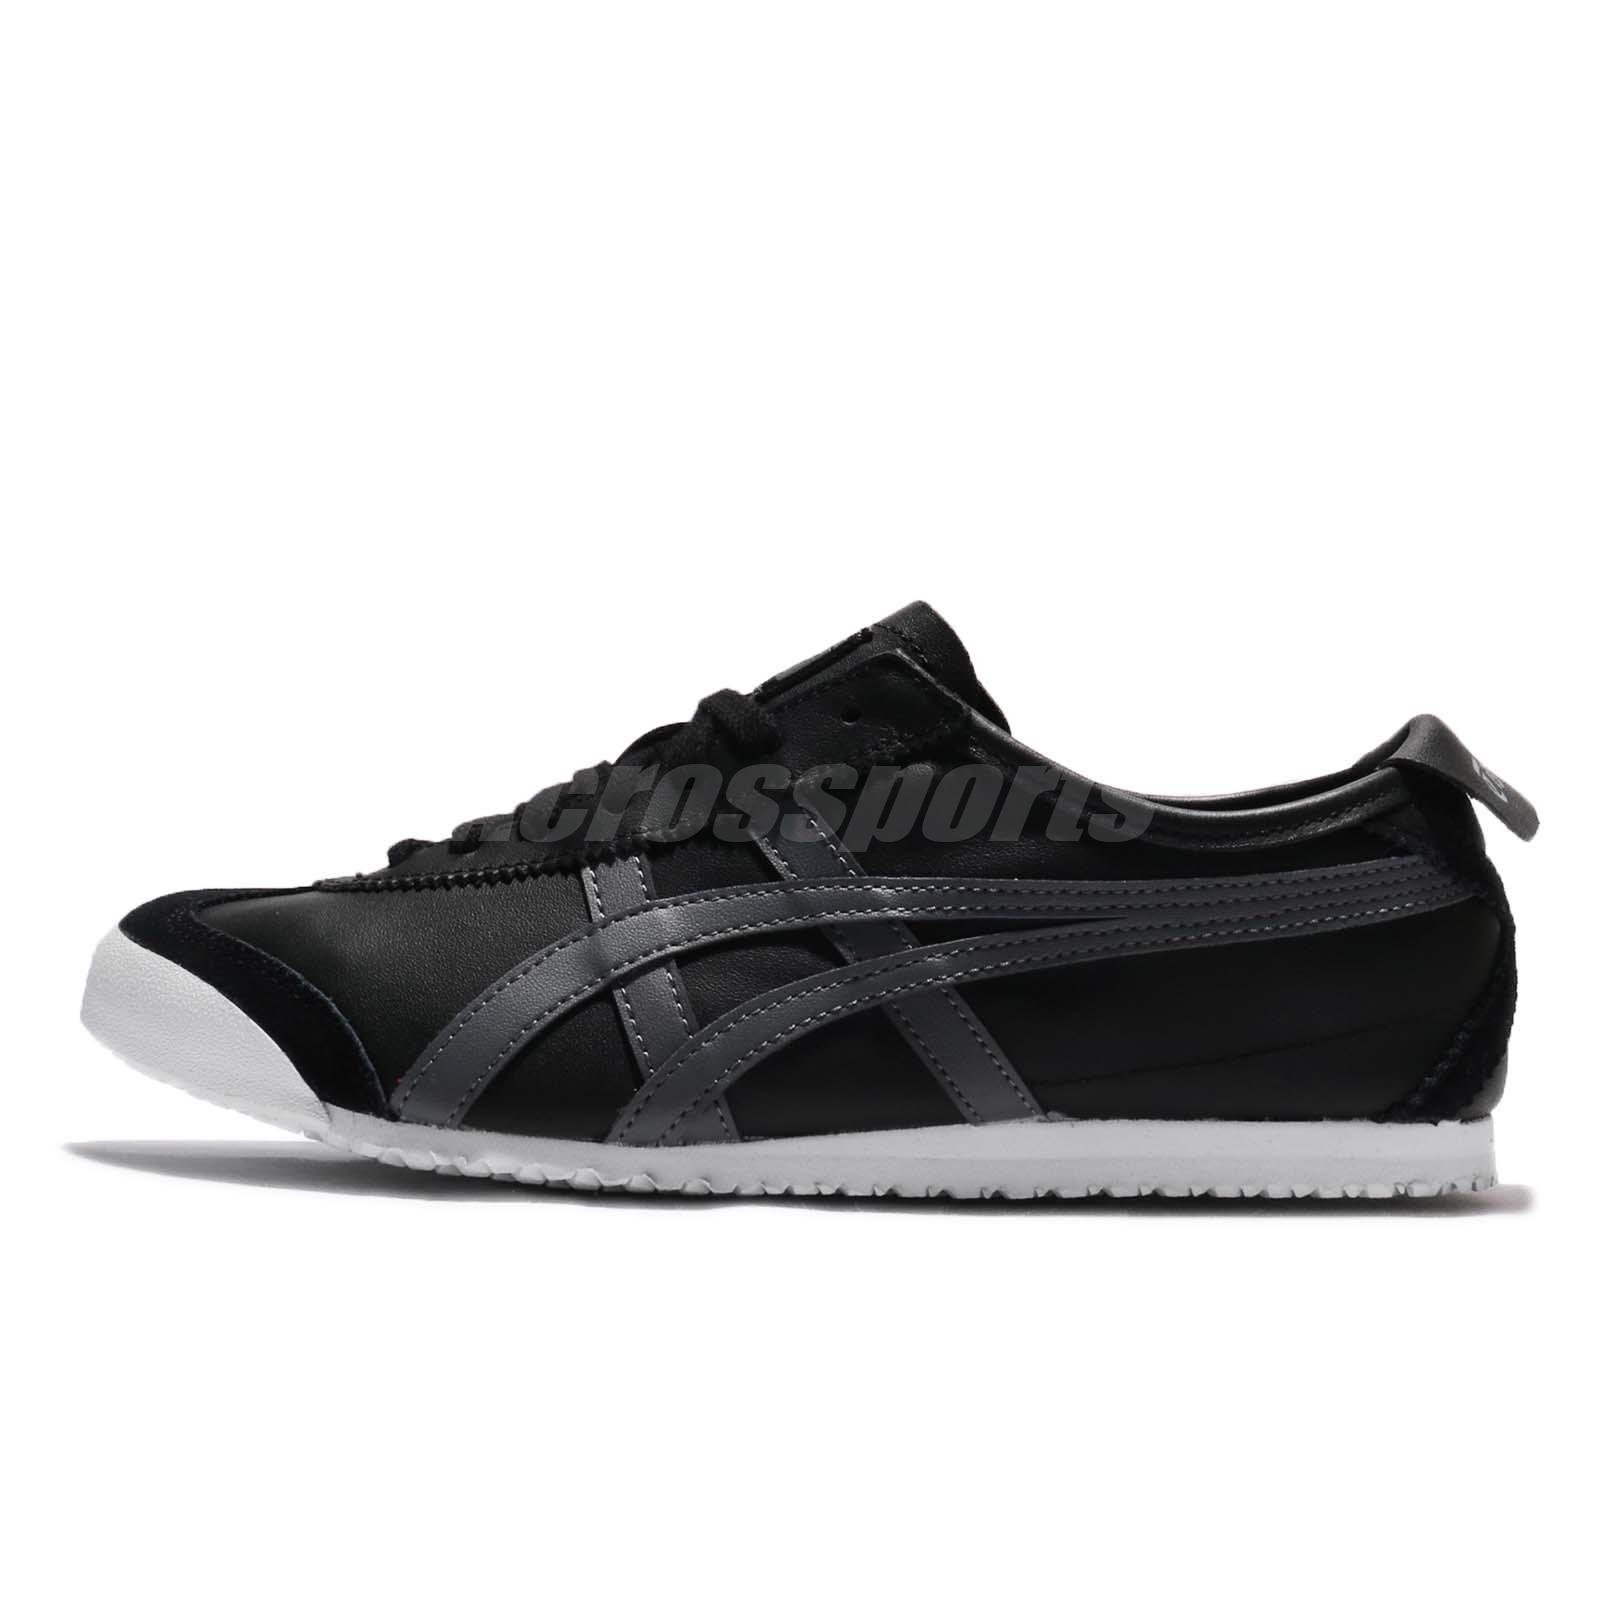 innovative design c2e25 adbe9 Details about Asics Onitsuka Tiger Mexico 66 Black Carbon Men Shoes  Sneakers D4J2L-9097